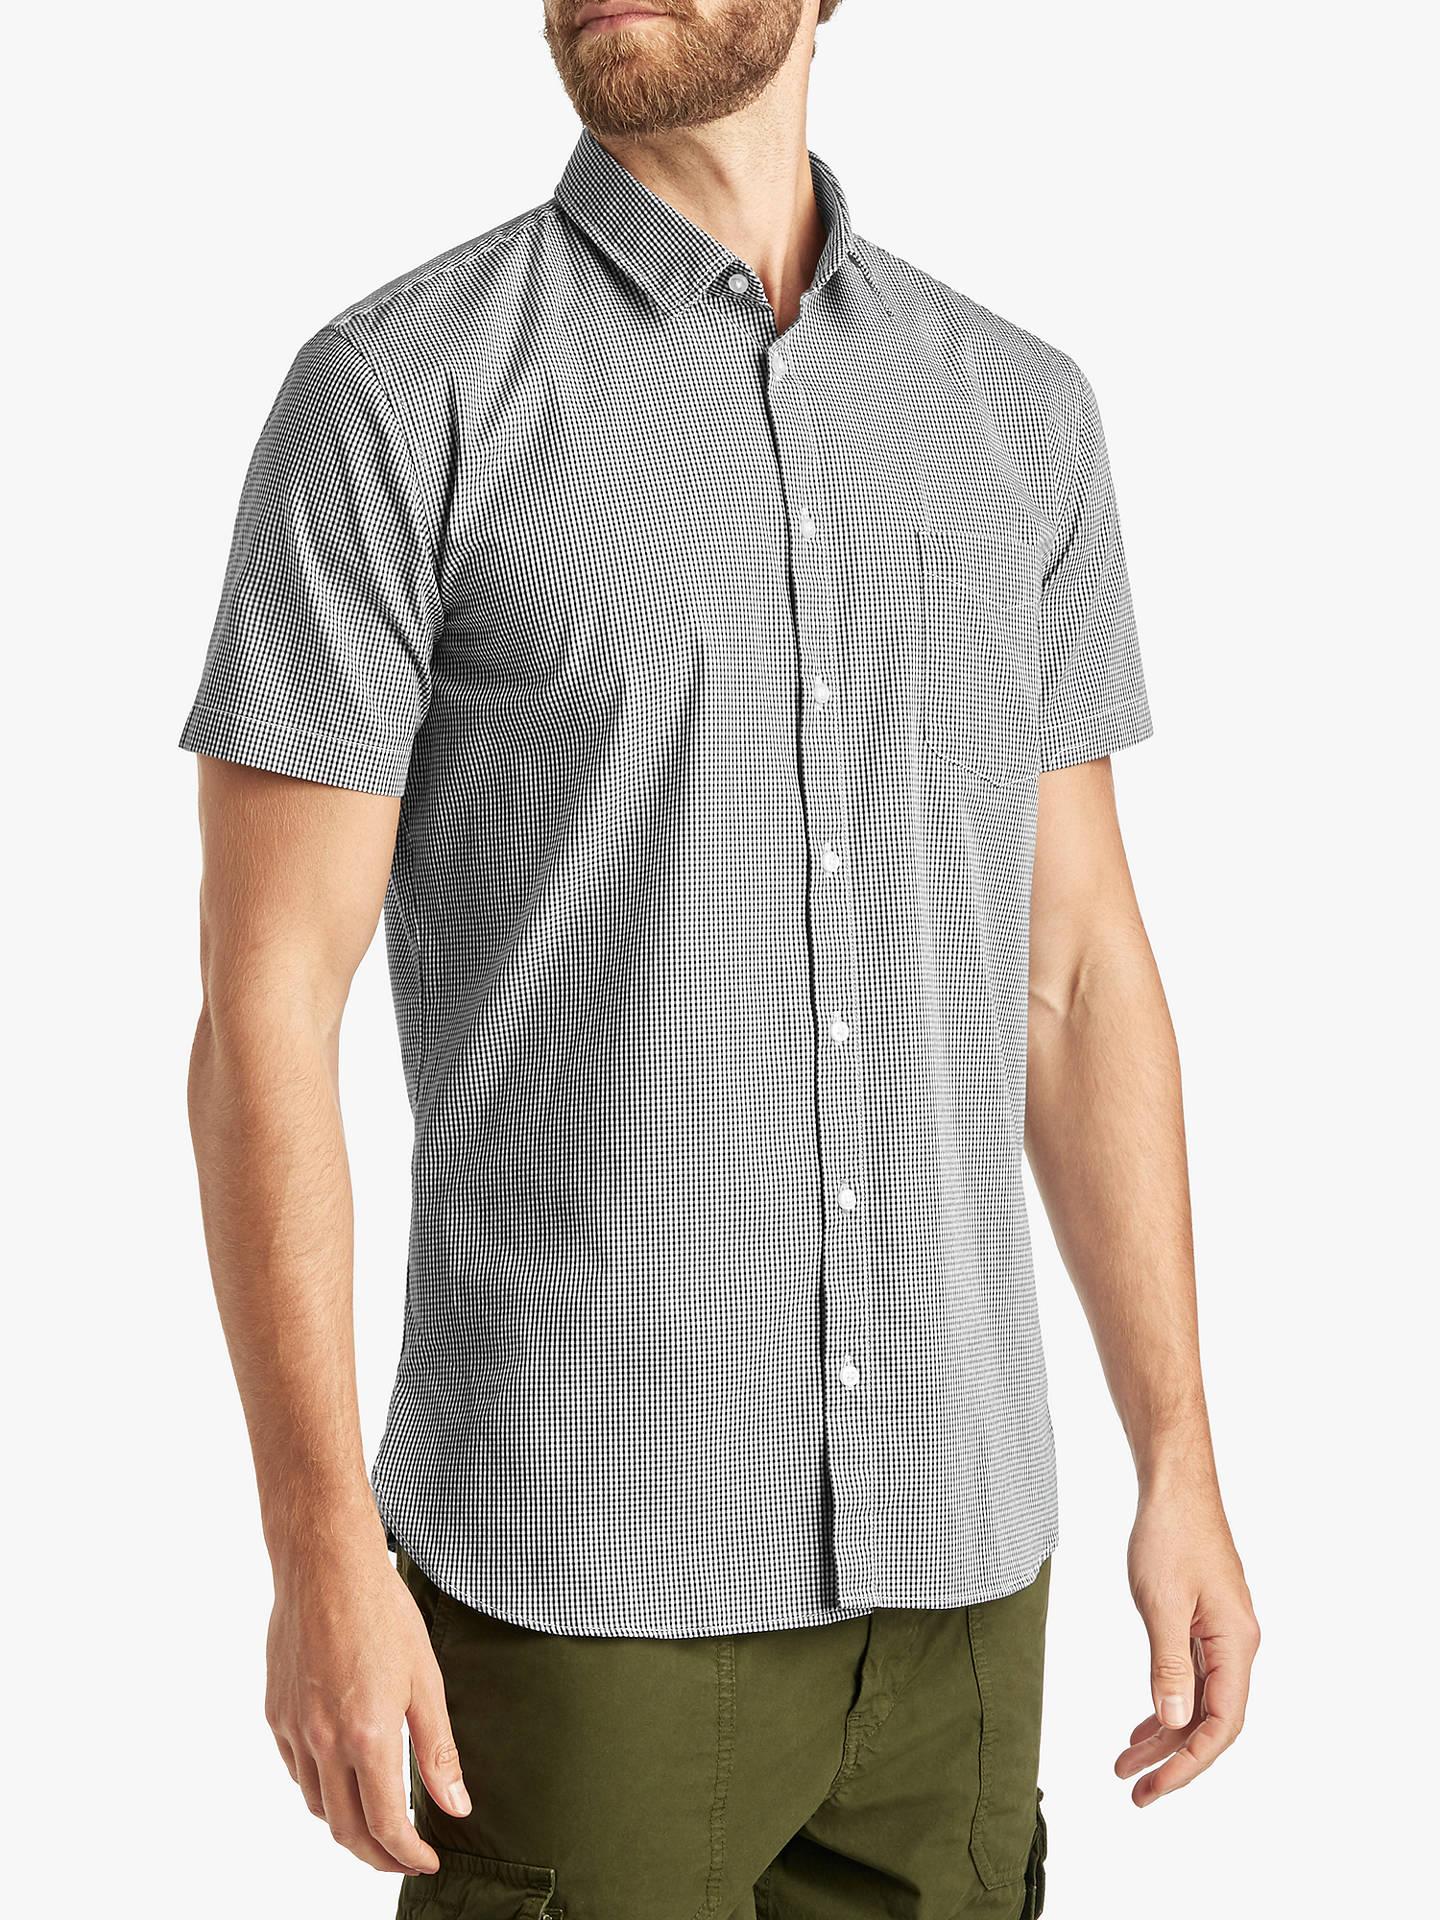 84b8aa7c5 Buy BOSS Magneton Short Sleeve Mini Check Shirt, Dark Blue, M Online at  johnlewis ...